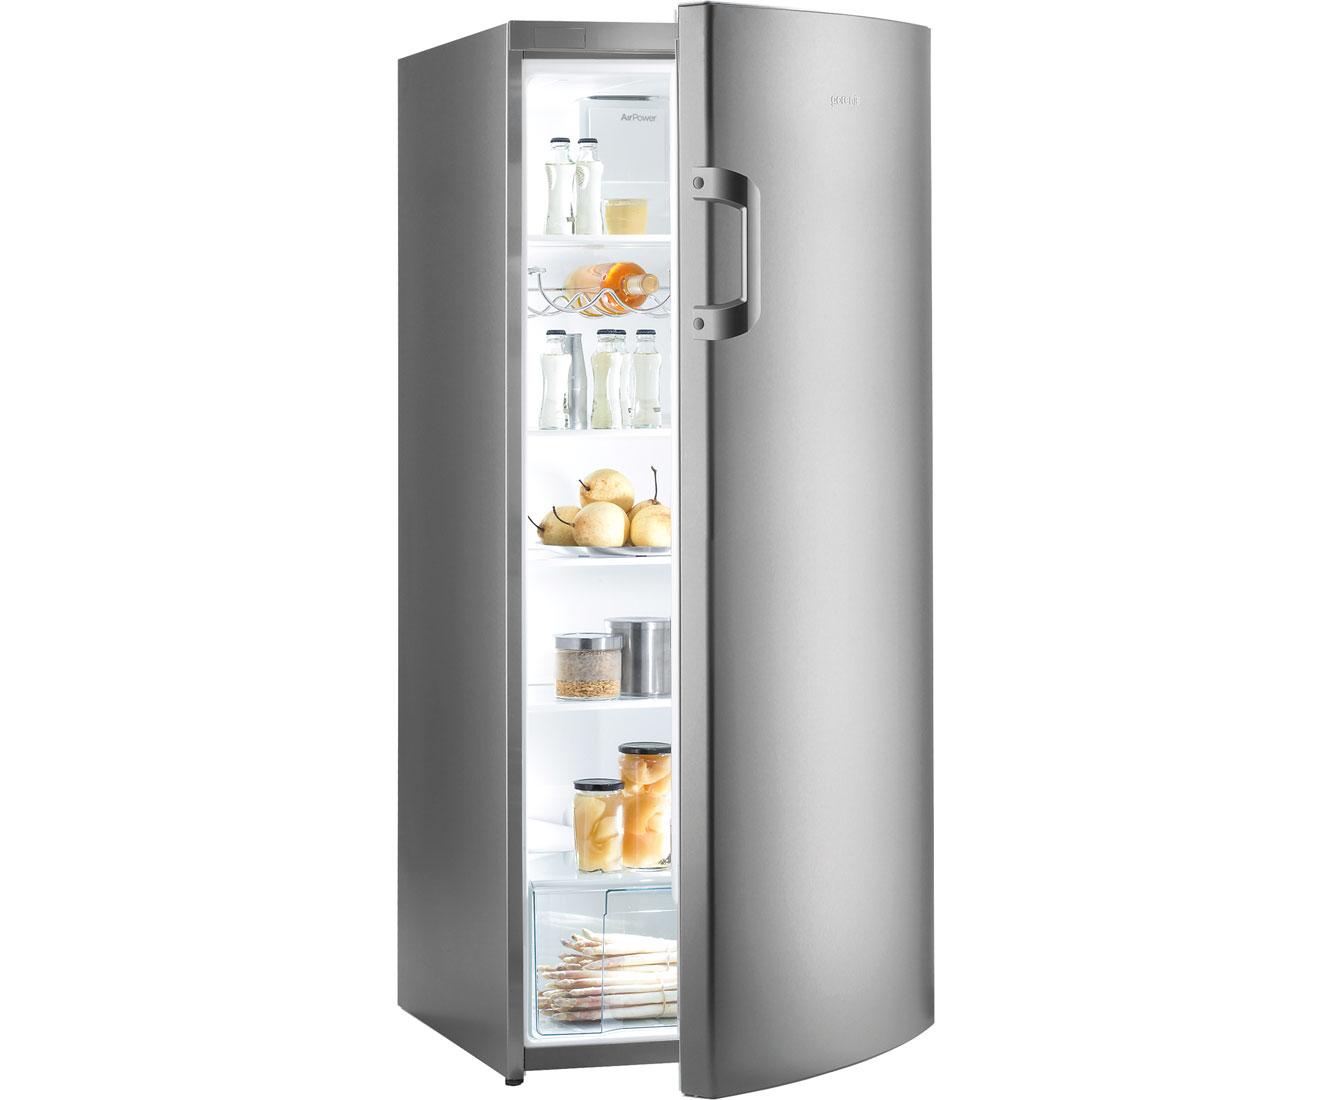 Retro Kühlschrank Wien : Kühlschrank american style retro the bosch retro refrigerator